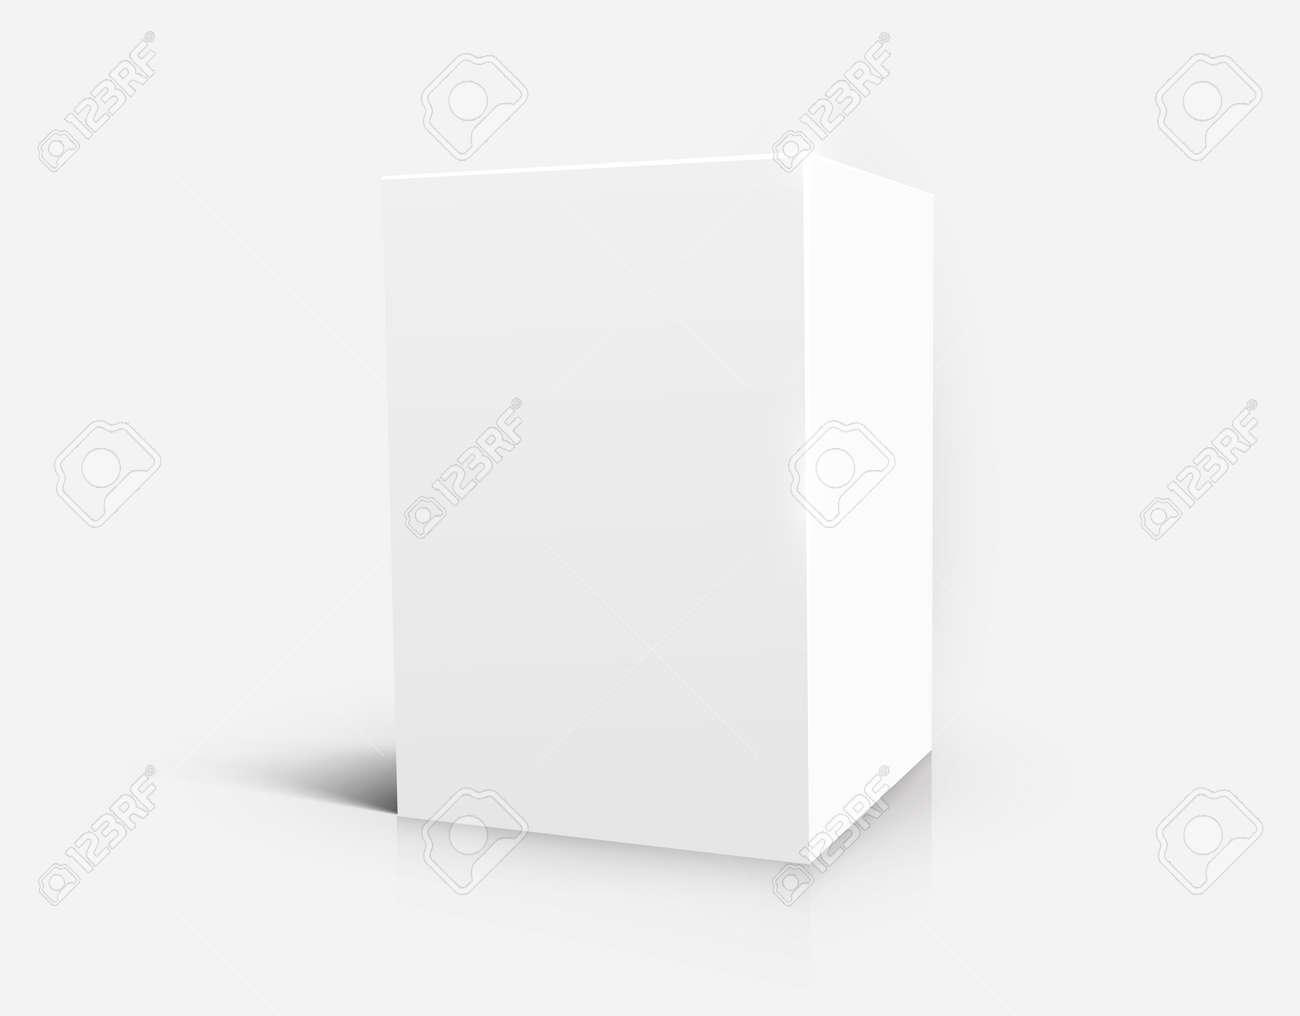 Blank white cube isolated on white background. Vector illustration - 128049066